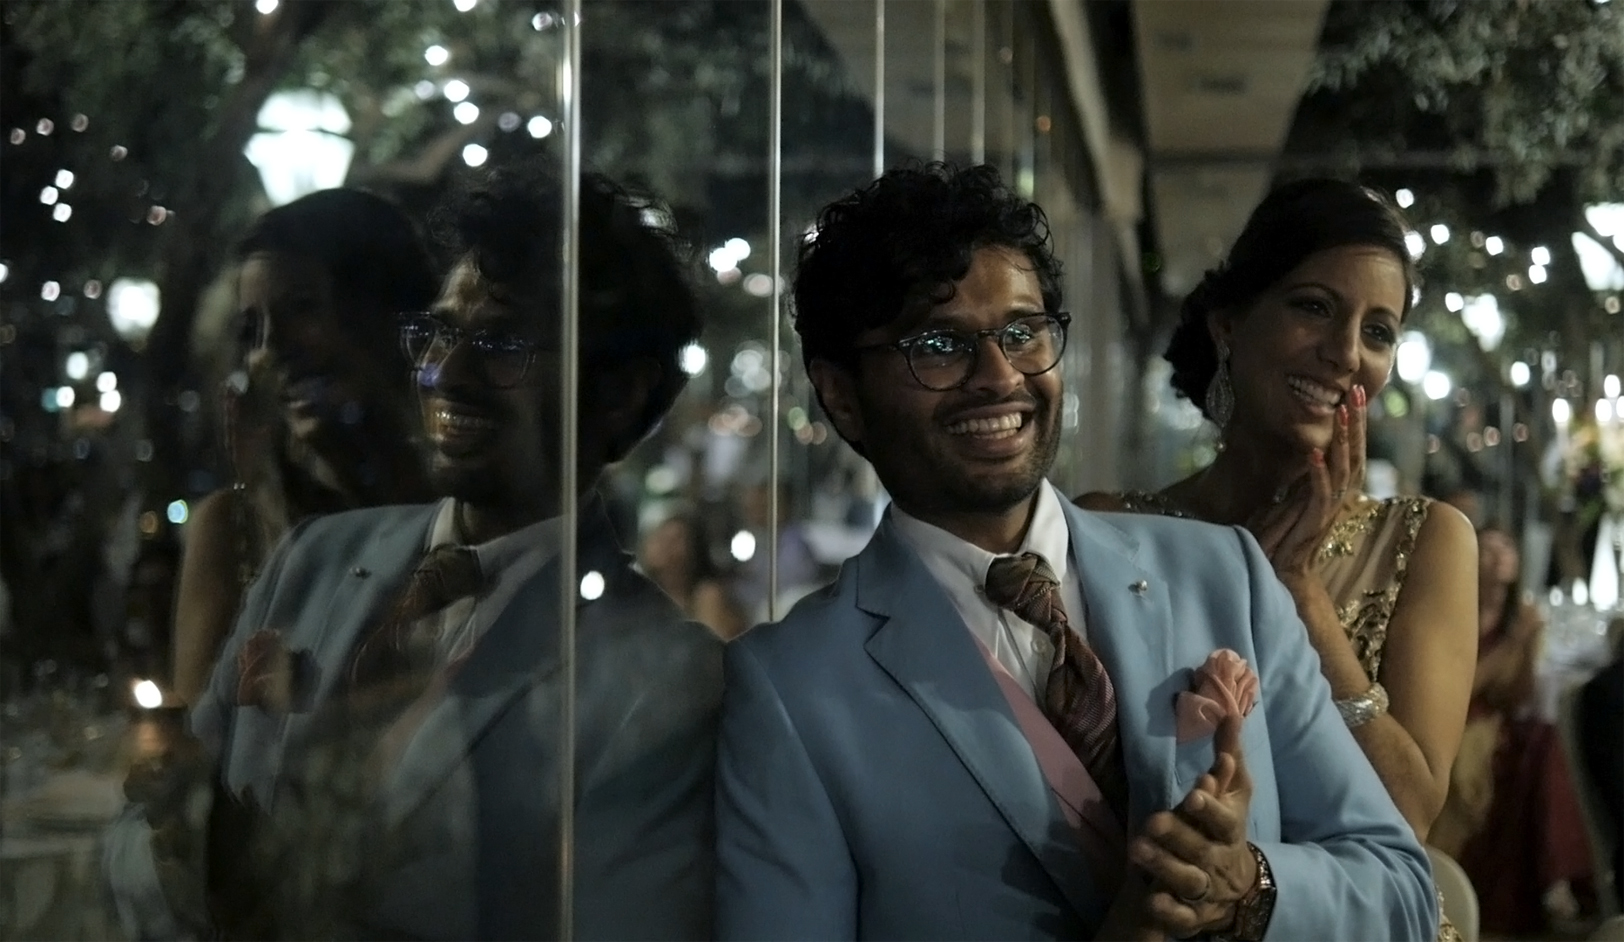 matrimonio-indiano-indiani-golfo-di-napoli-hotel-cocumella-sorrento-amalfi.jpg